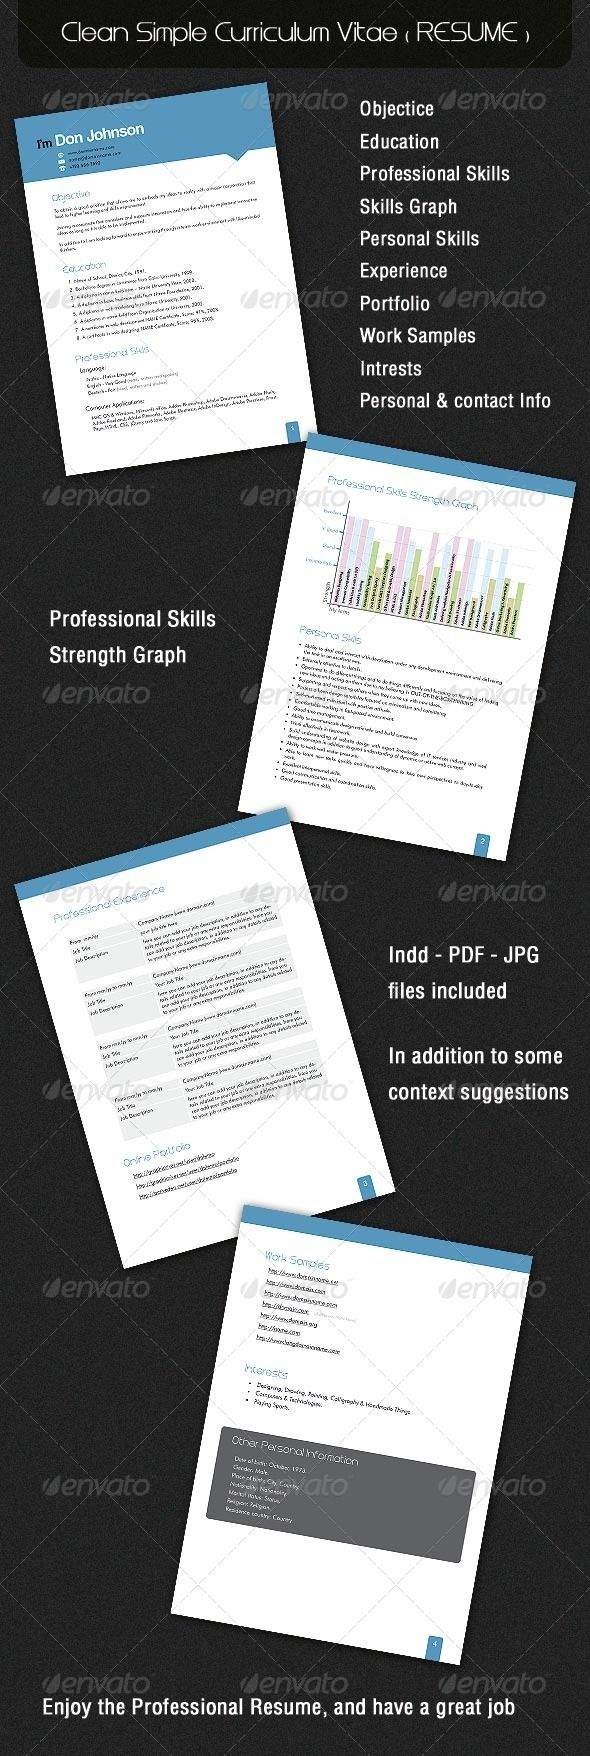 Clean Simple Curriculum Vitae ( RESUME ) | Resume cv, Print ...